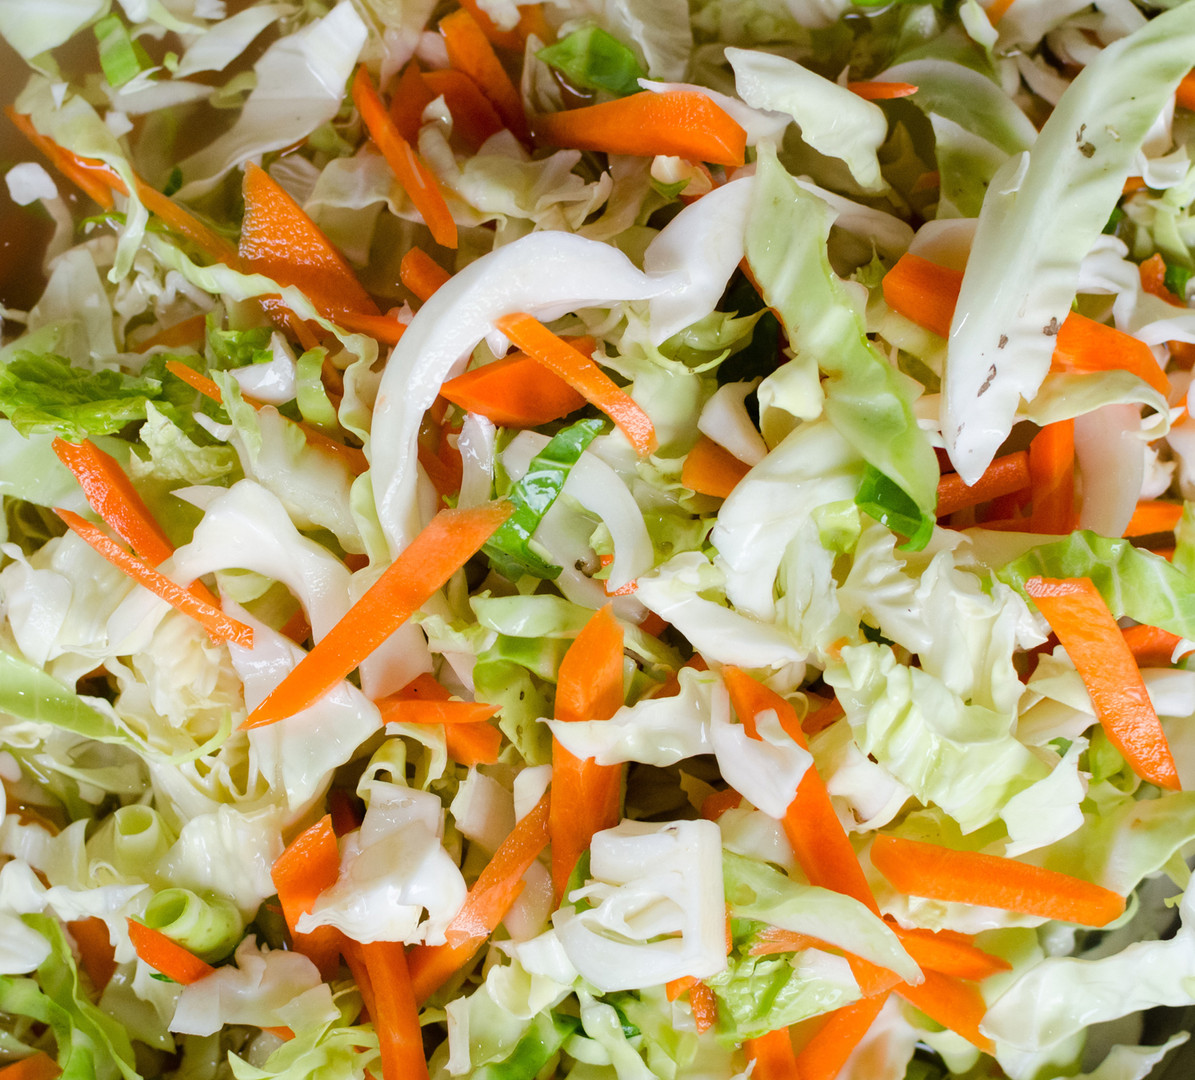 Landhof-Hilden-Salate-04.jpg